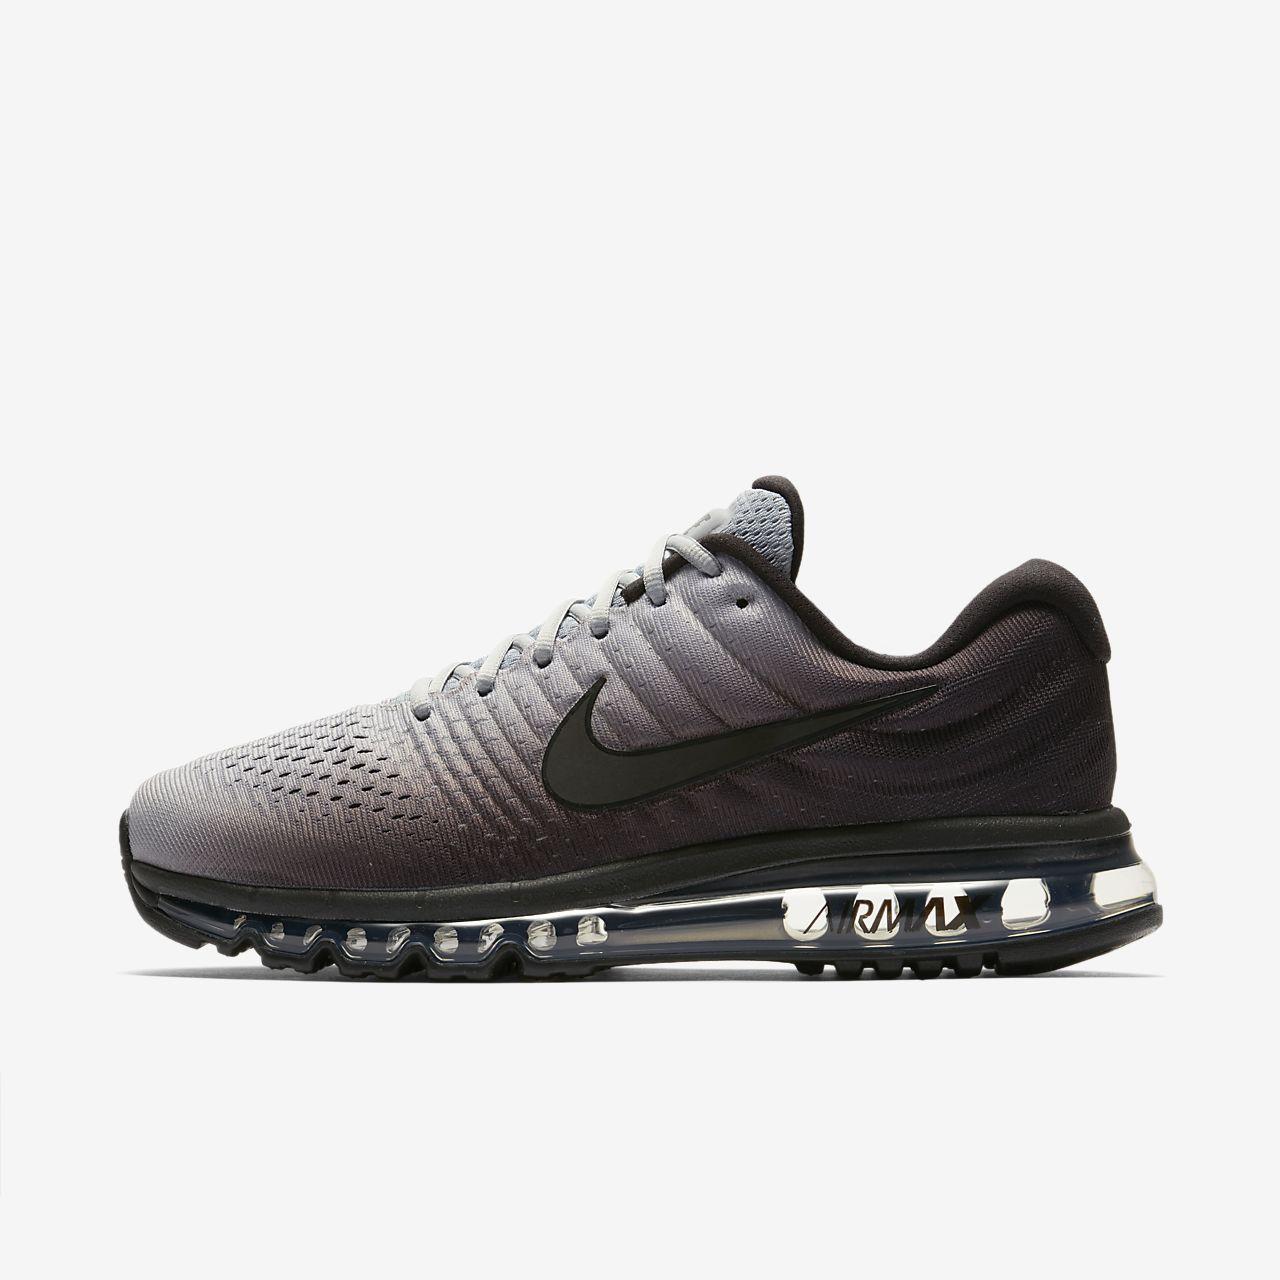 Sapatilhas de running Nike Air Max 2017 para homem